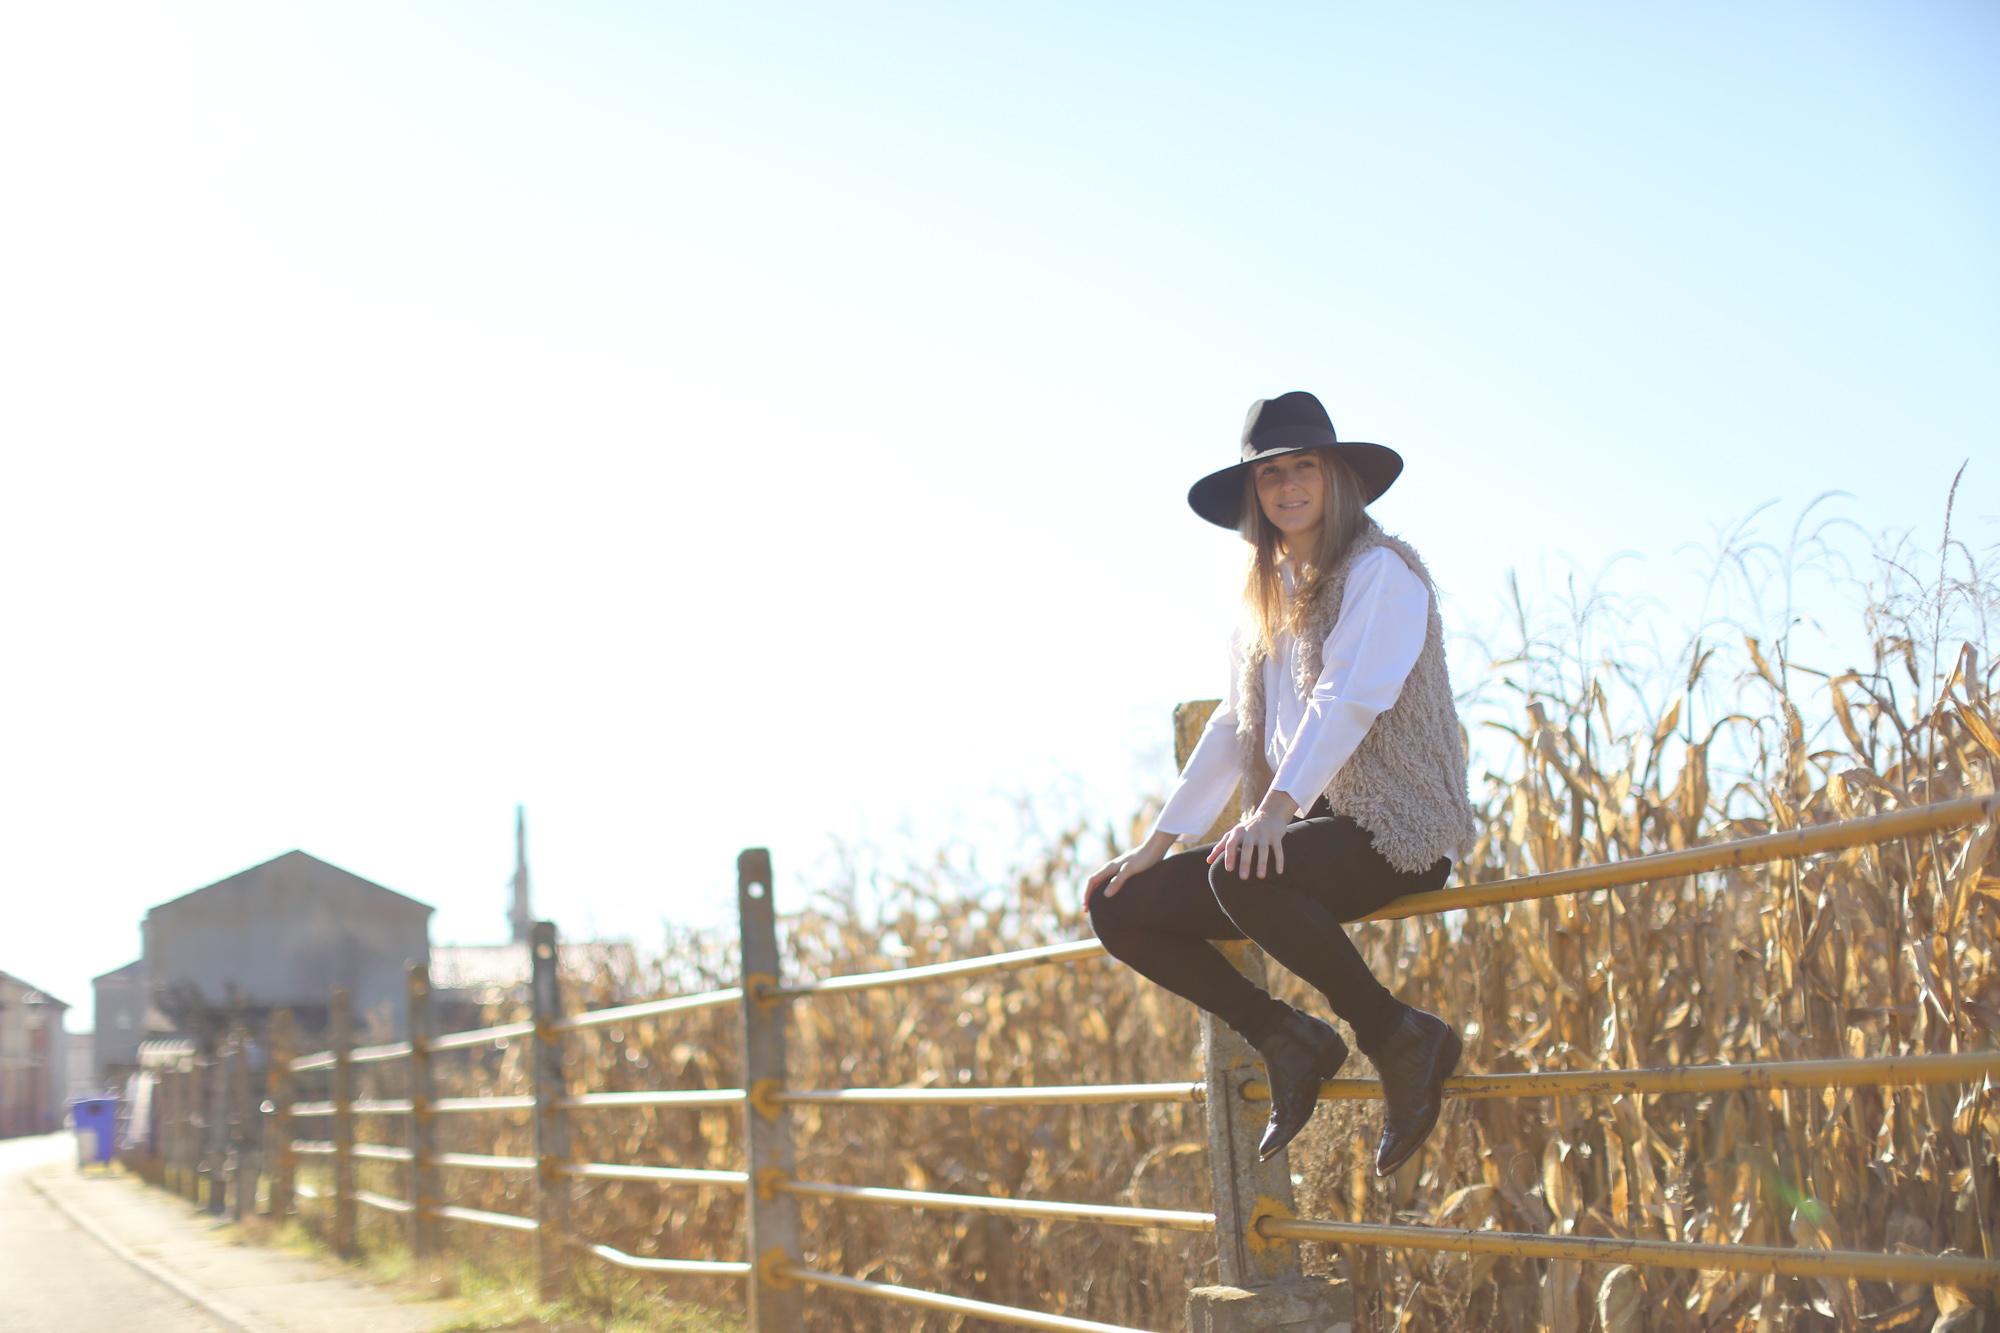 Clochet_streetstyle_cowboy_boots_fedora_hat_waistcoat-1-2